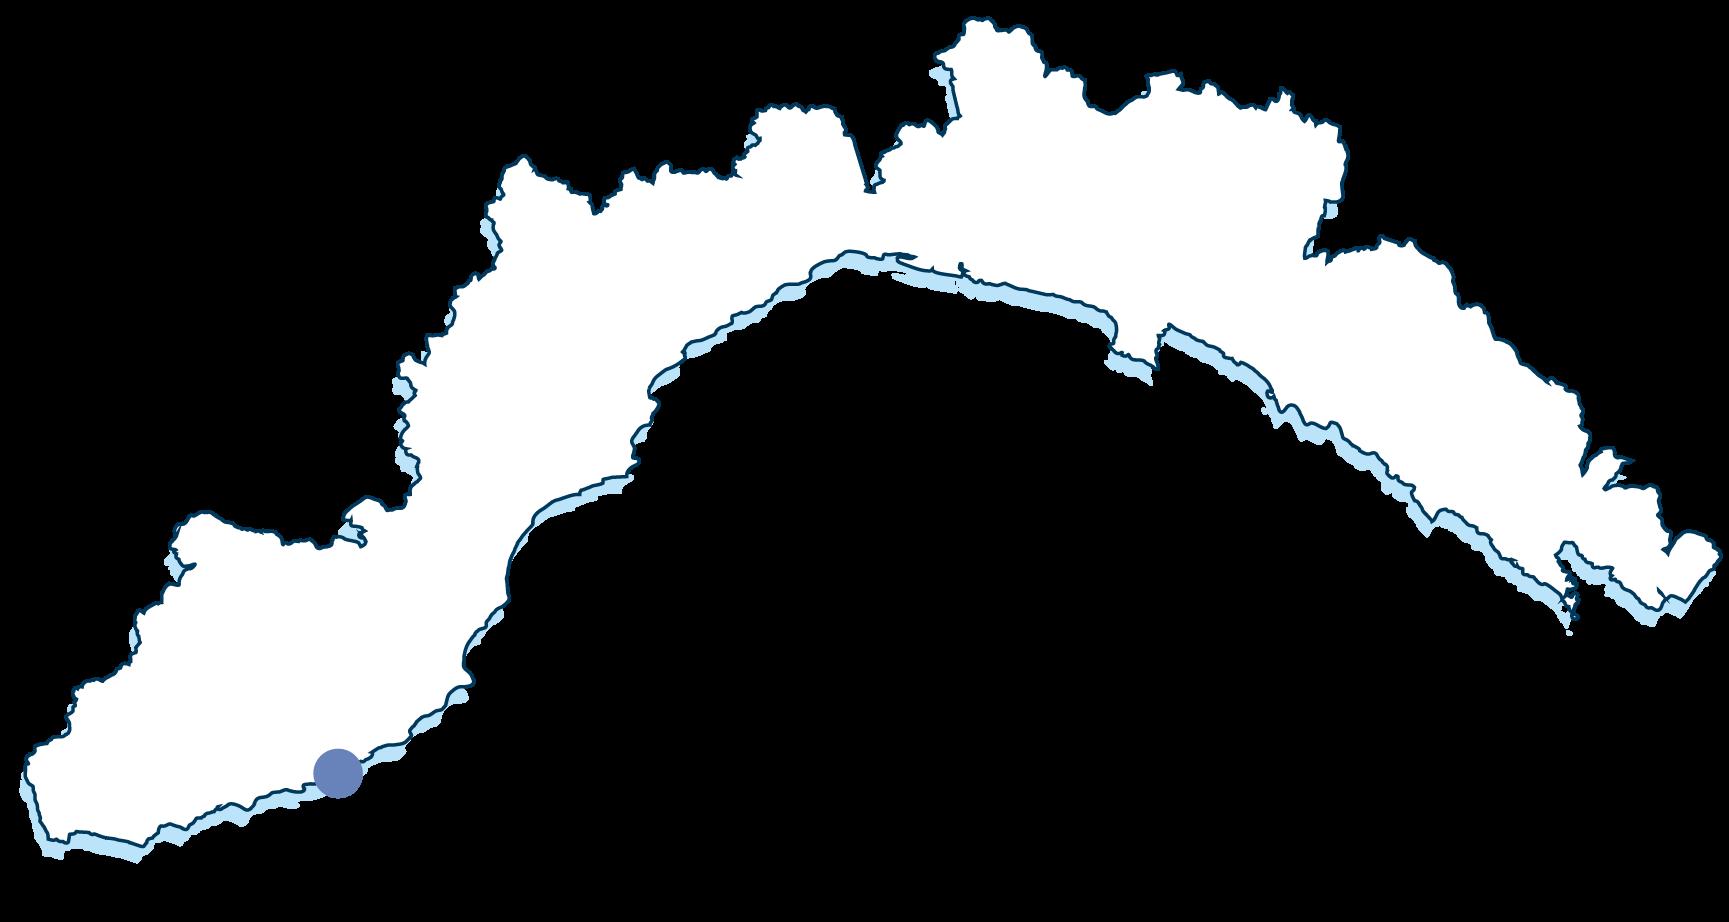 LIGURIA-CON-DIANO-MARINA